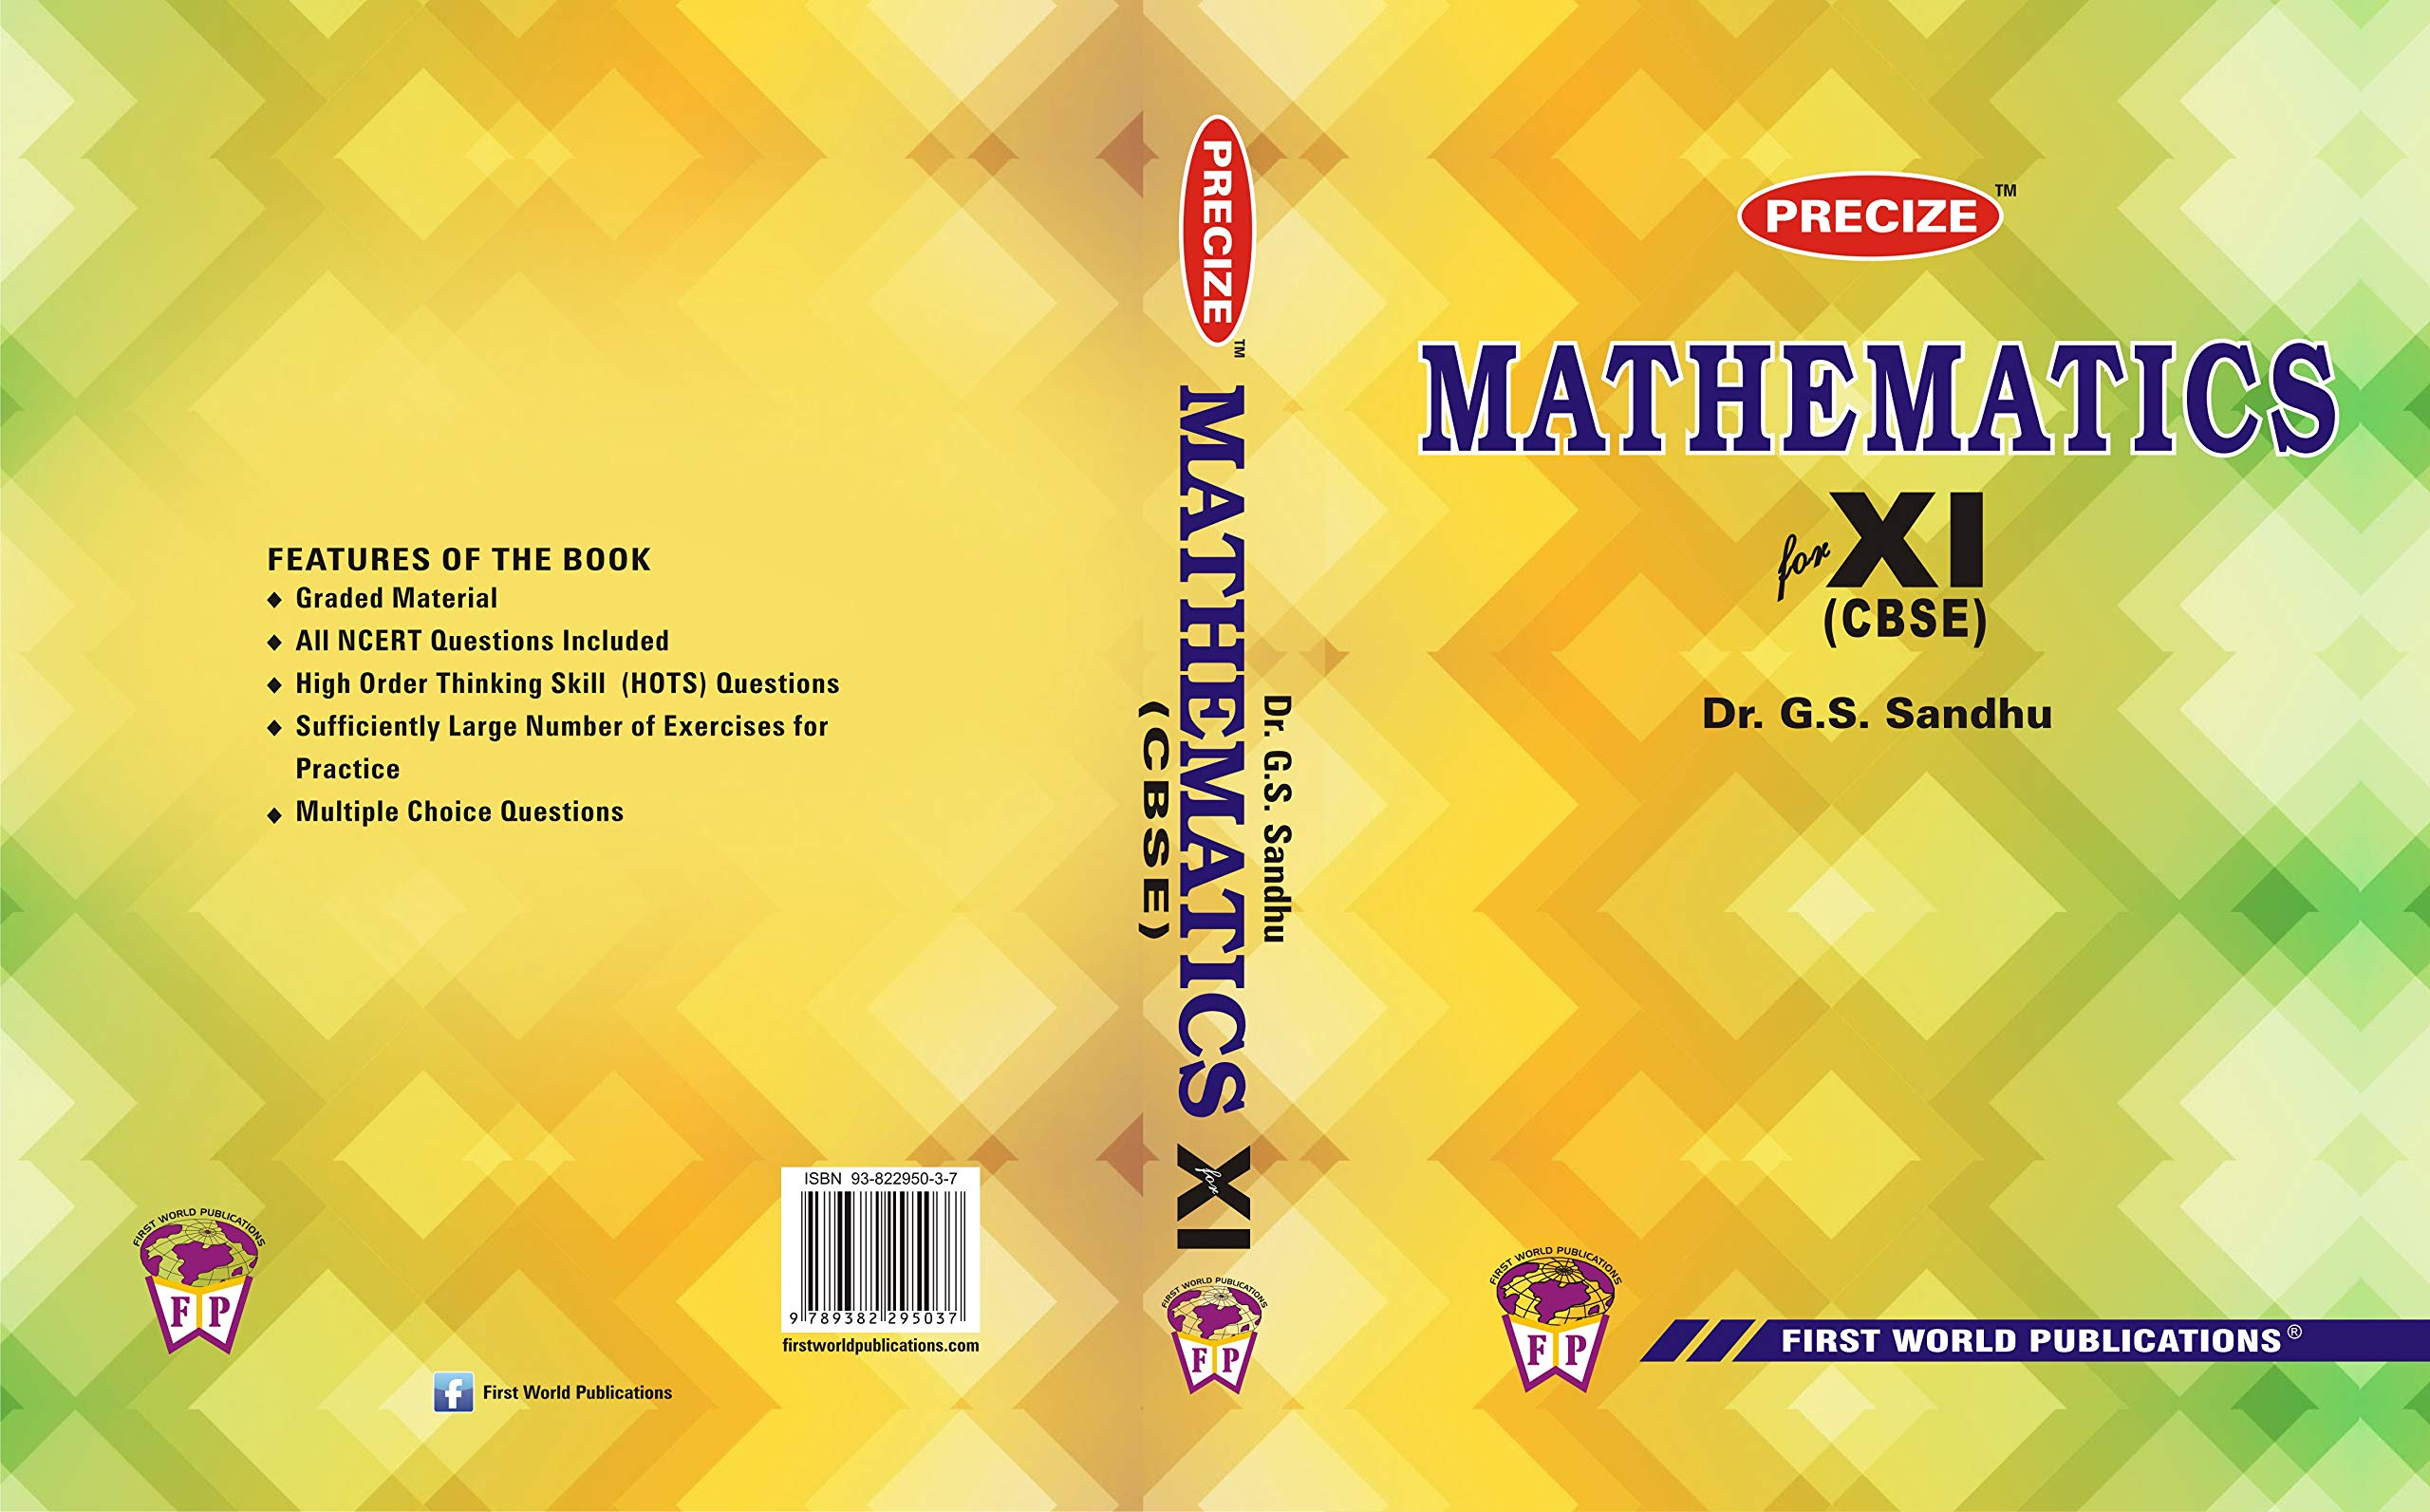 Precize Mathematics For XI English, Paperback, Dr  G S Sandhu